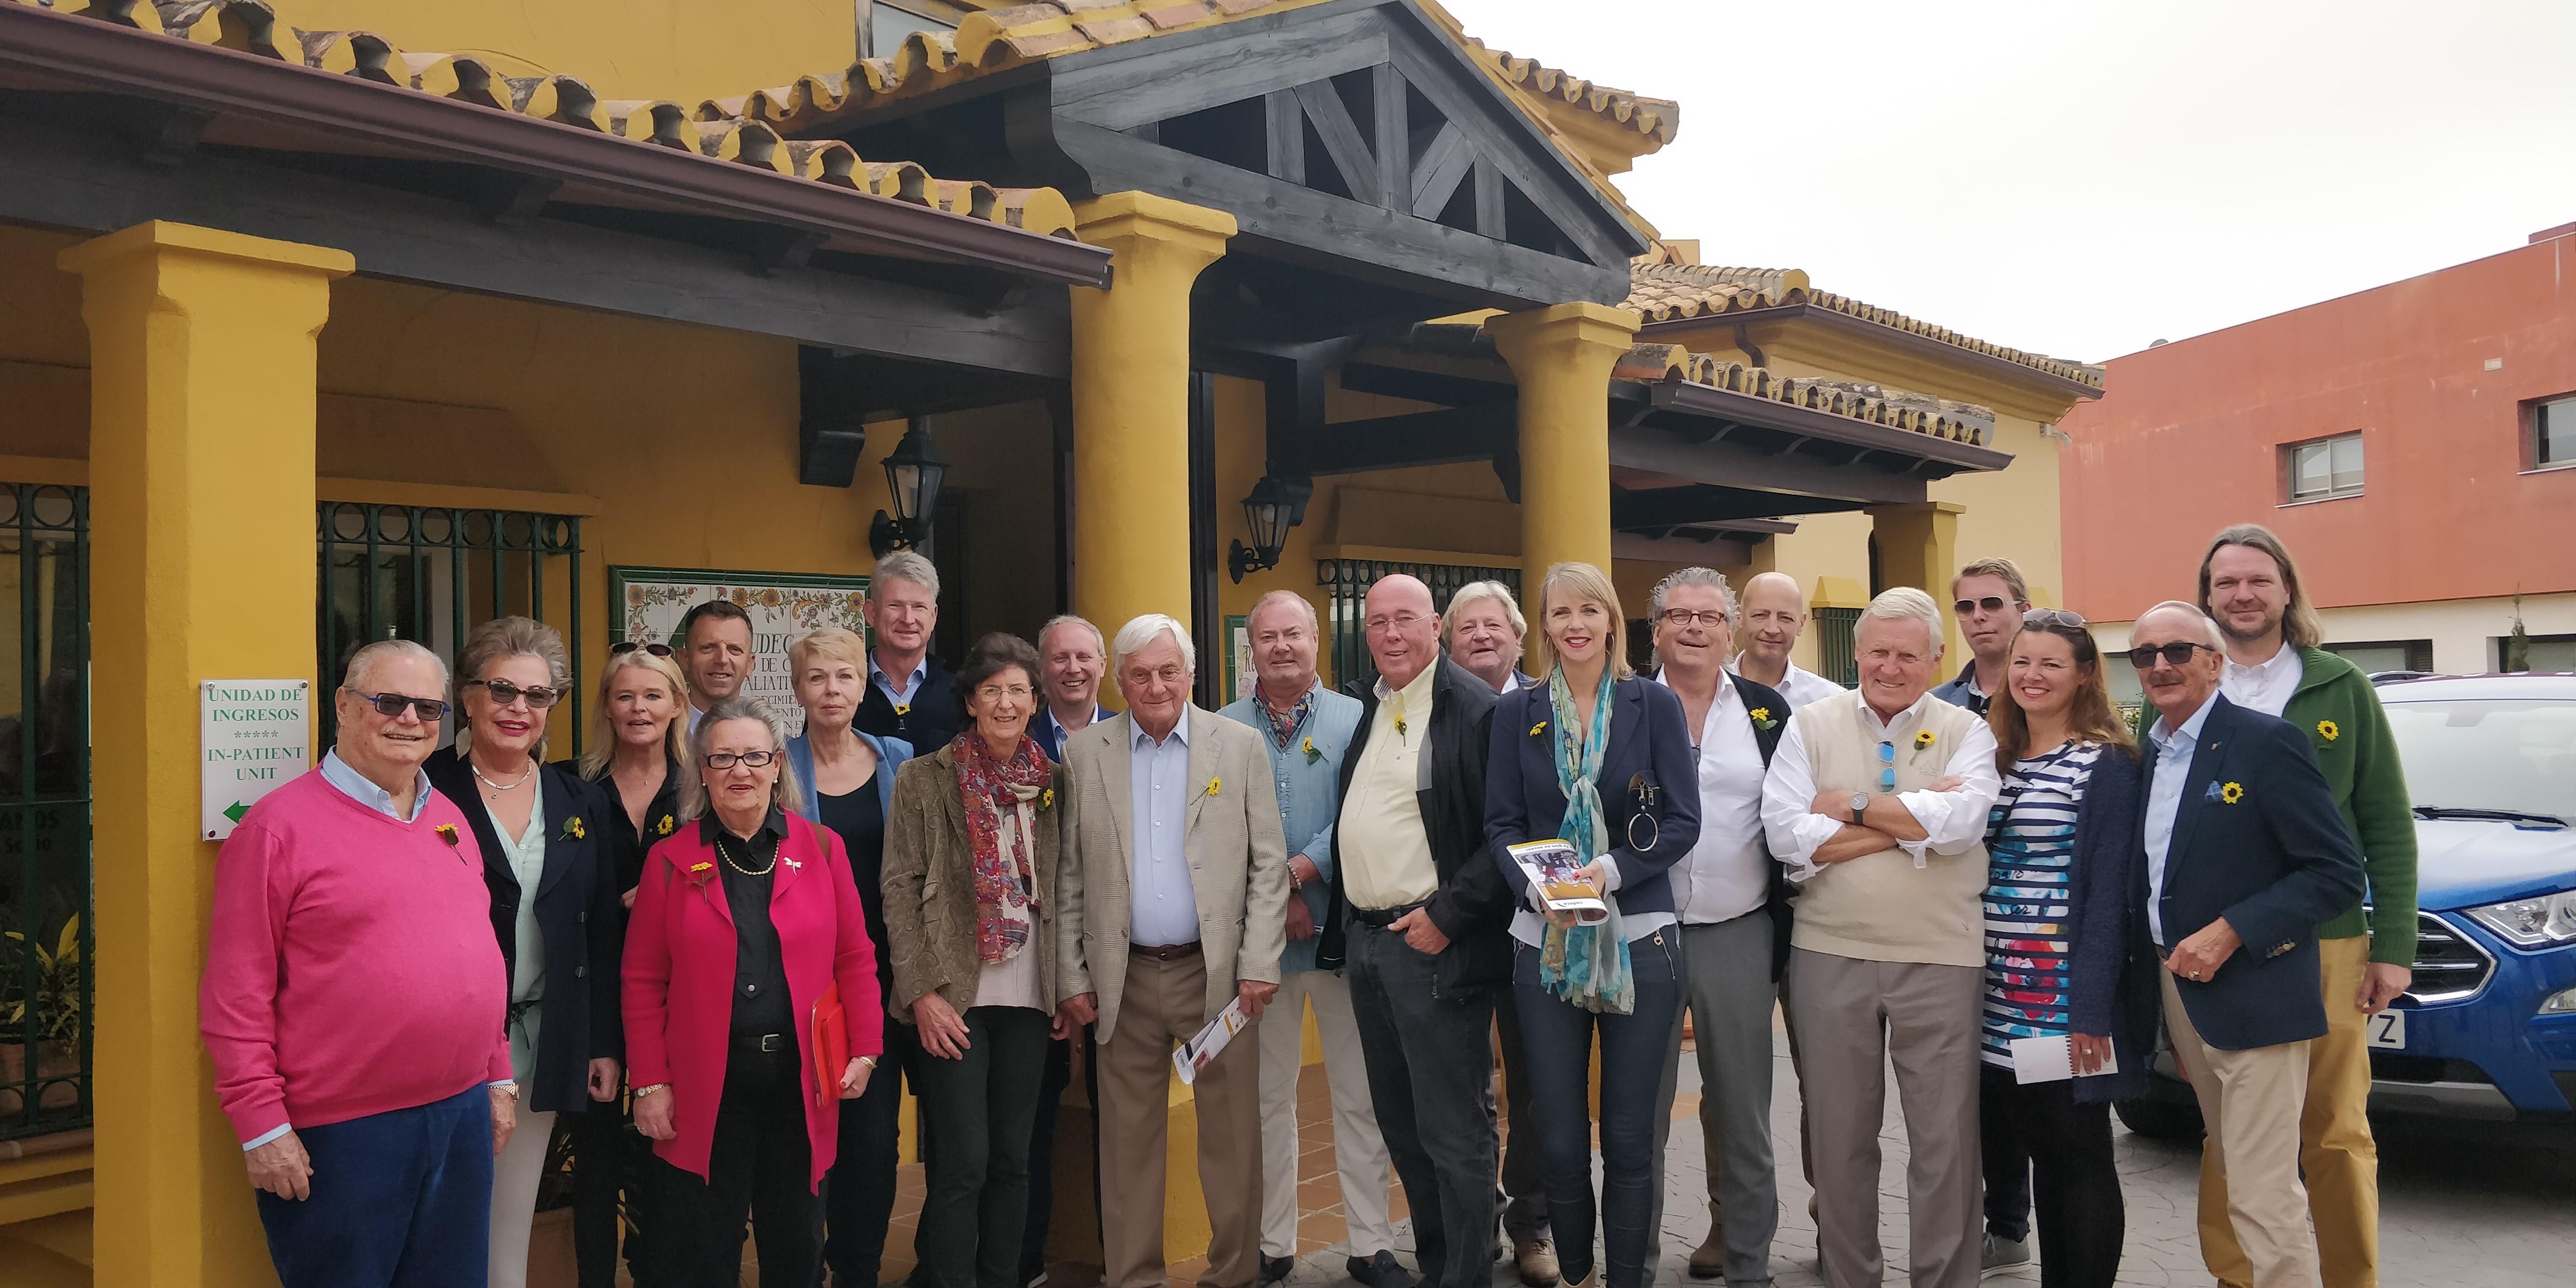 Visita del Club Holandés de Empresarios de Marbella